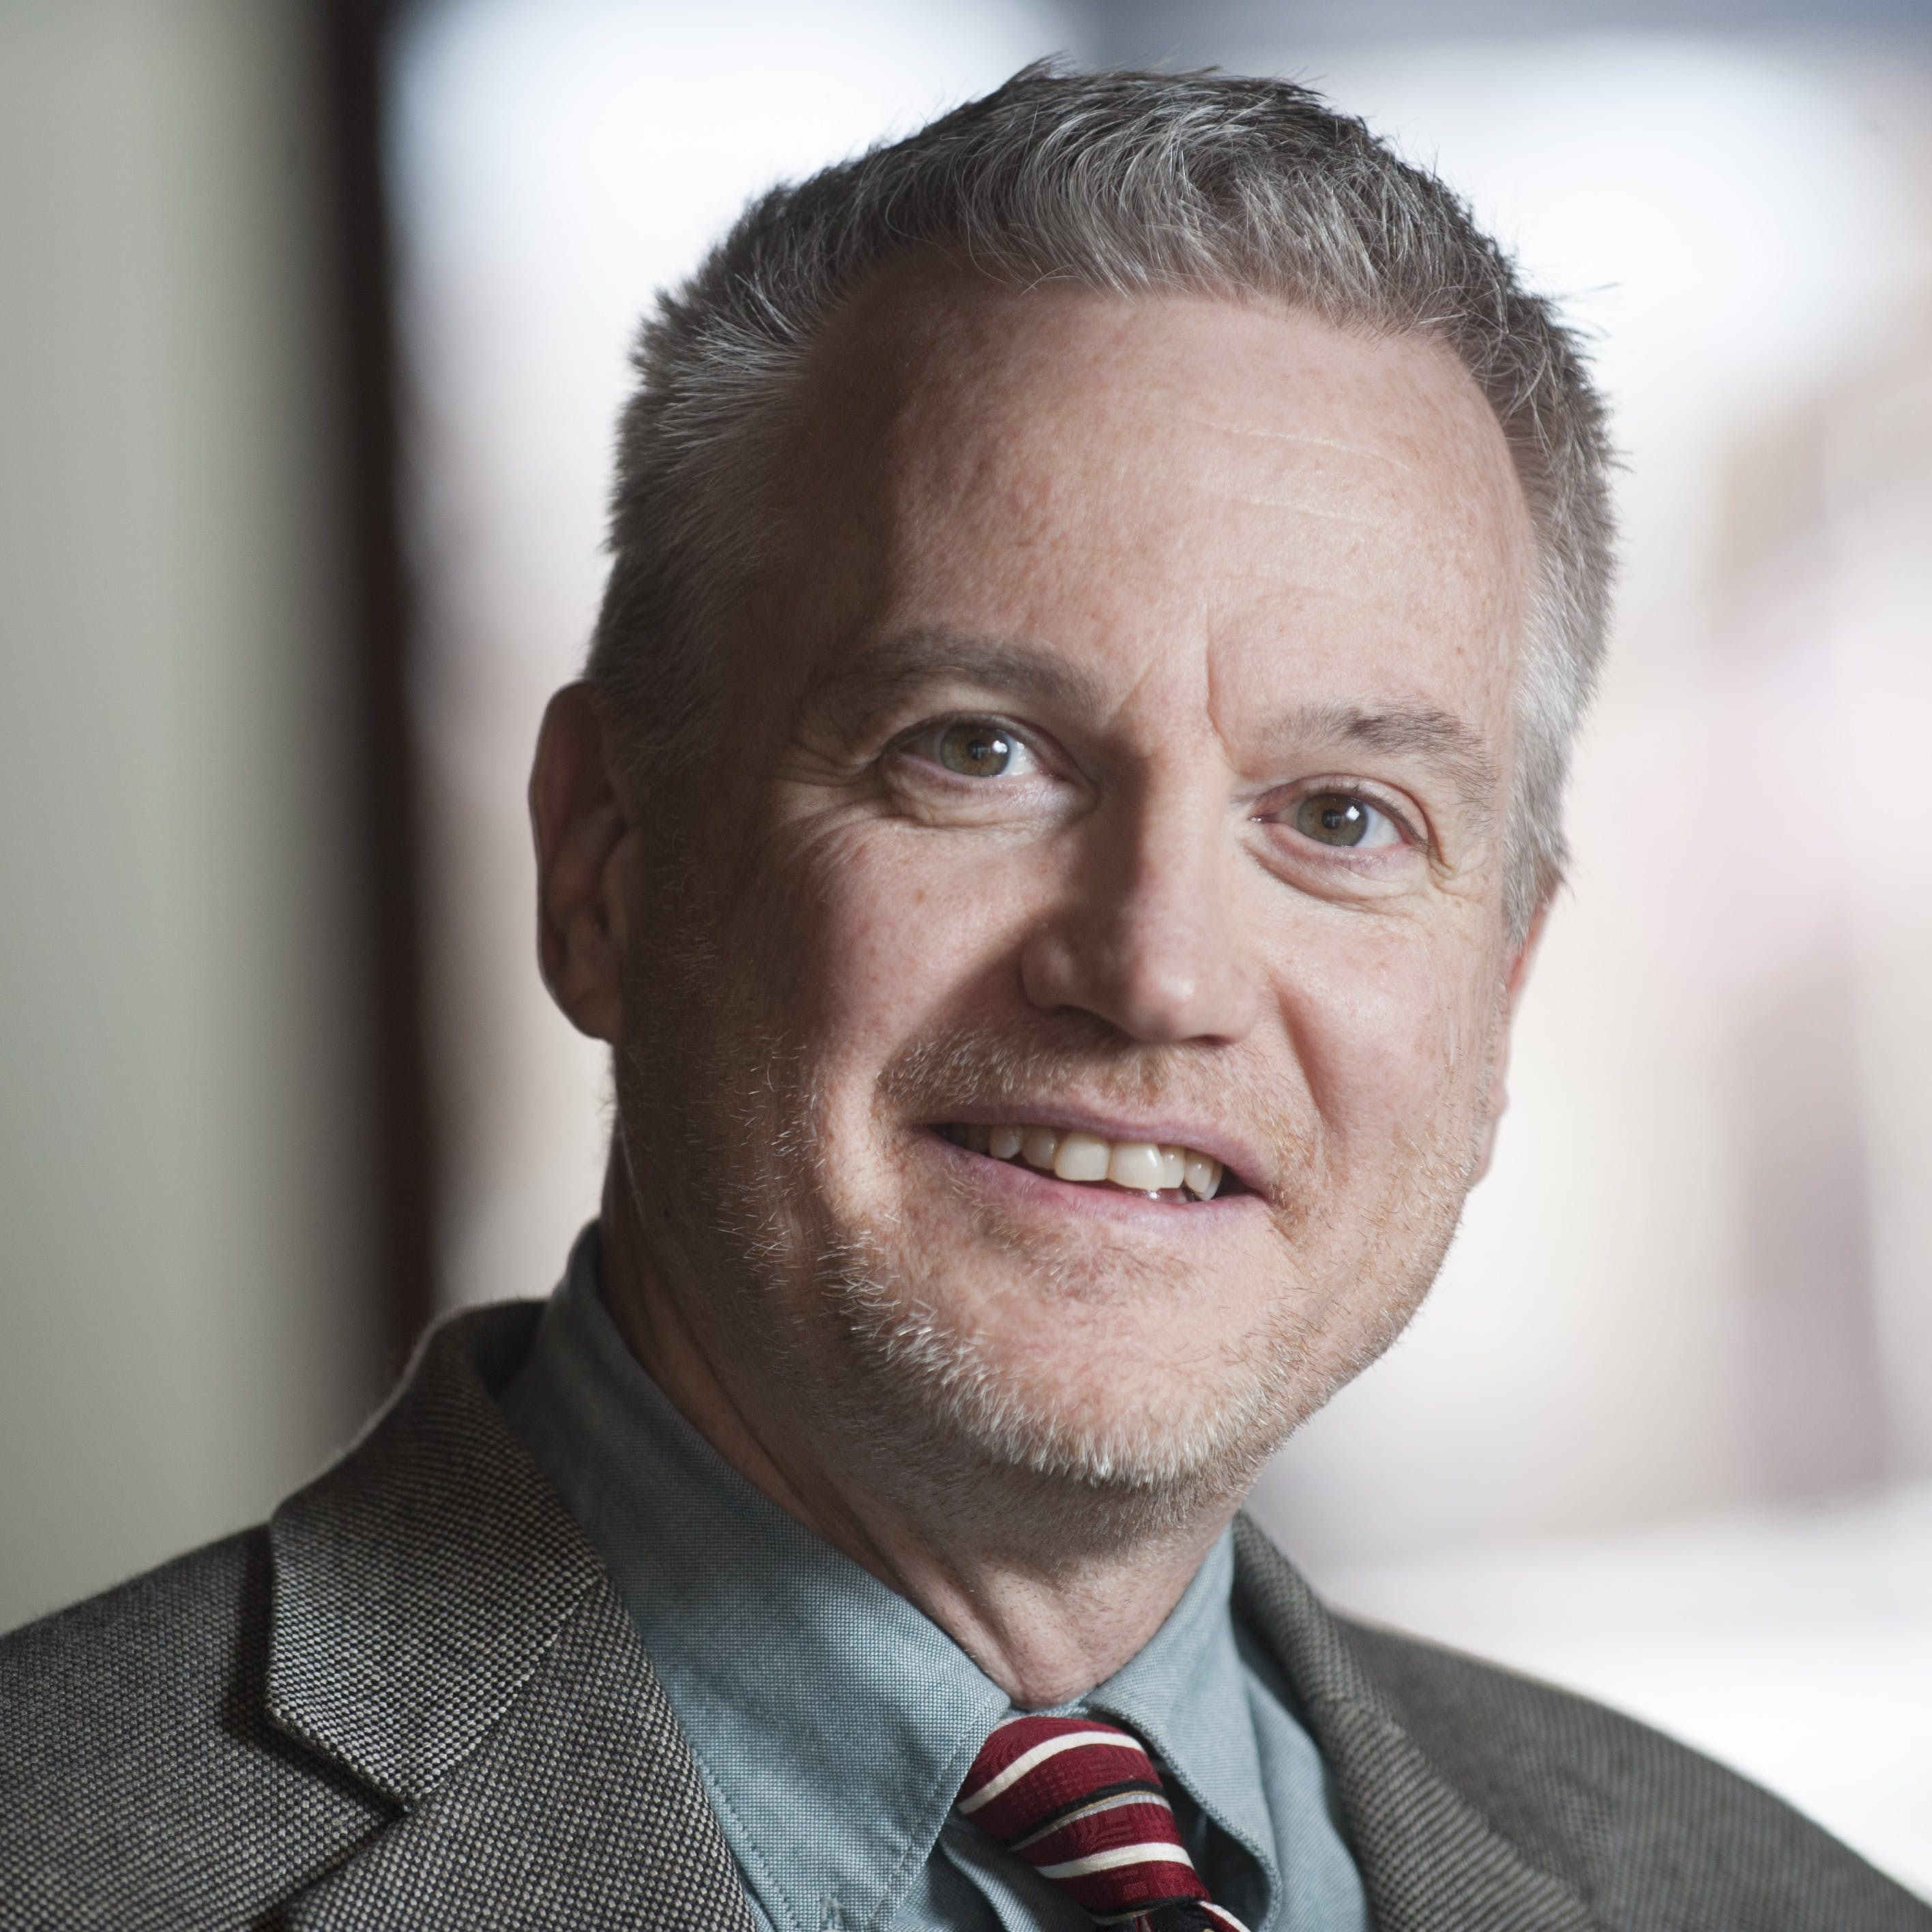 Patrick Keefe